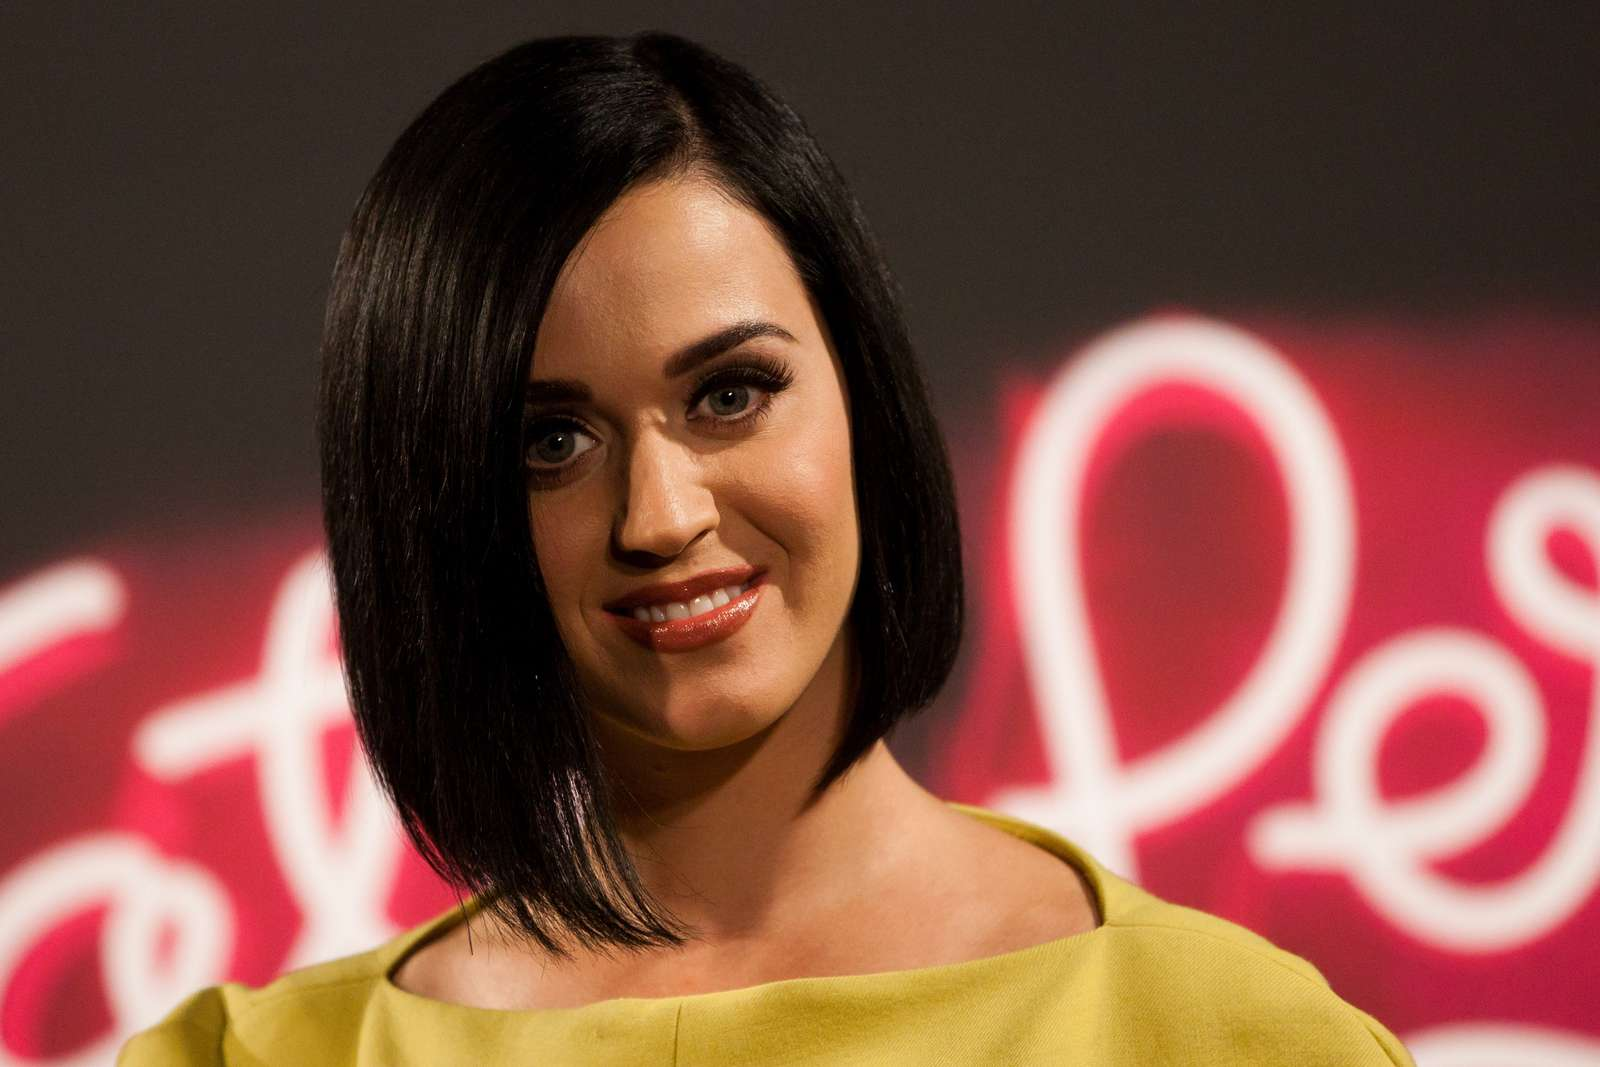 Katy Perry 2012 : katy-perry-photocall-part-of-me-in-rio-de-janeiro-09